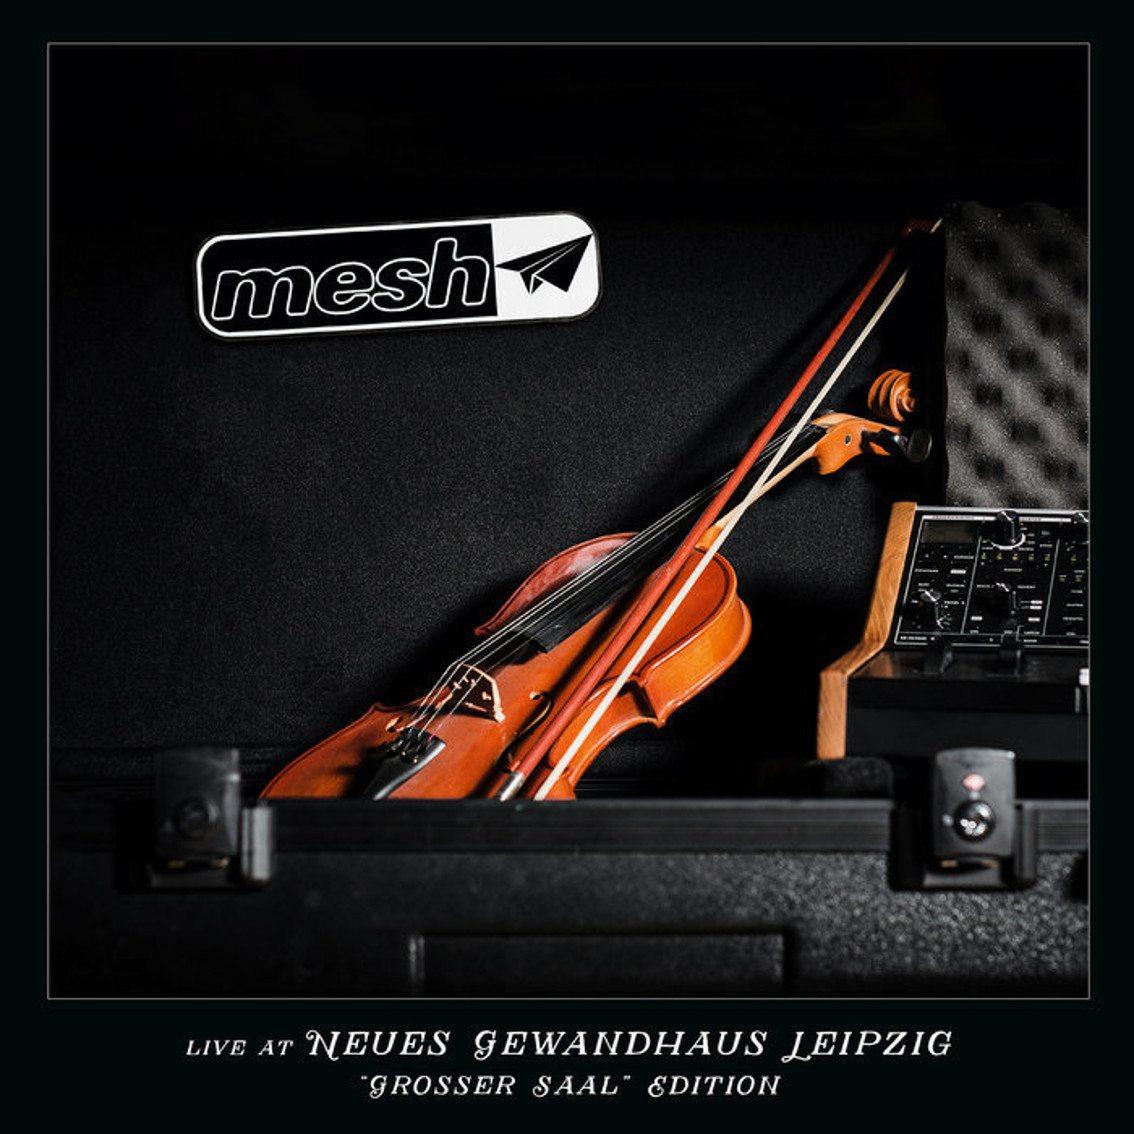 DVD/CD/vinyl Boxset for live Mesh release'Live at Neues Gewandhaus Leipzig' - get it now